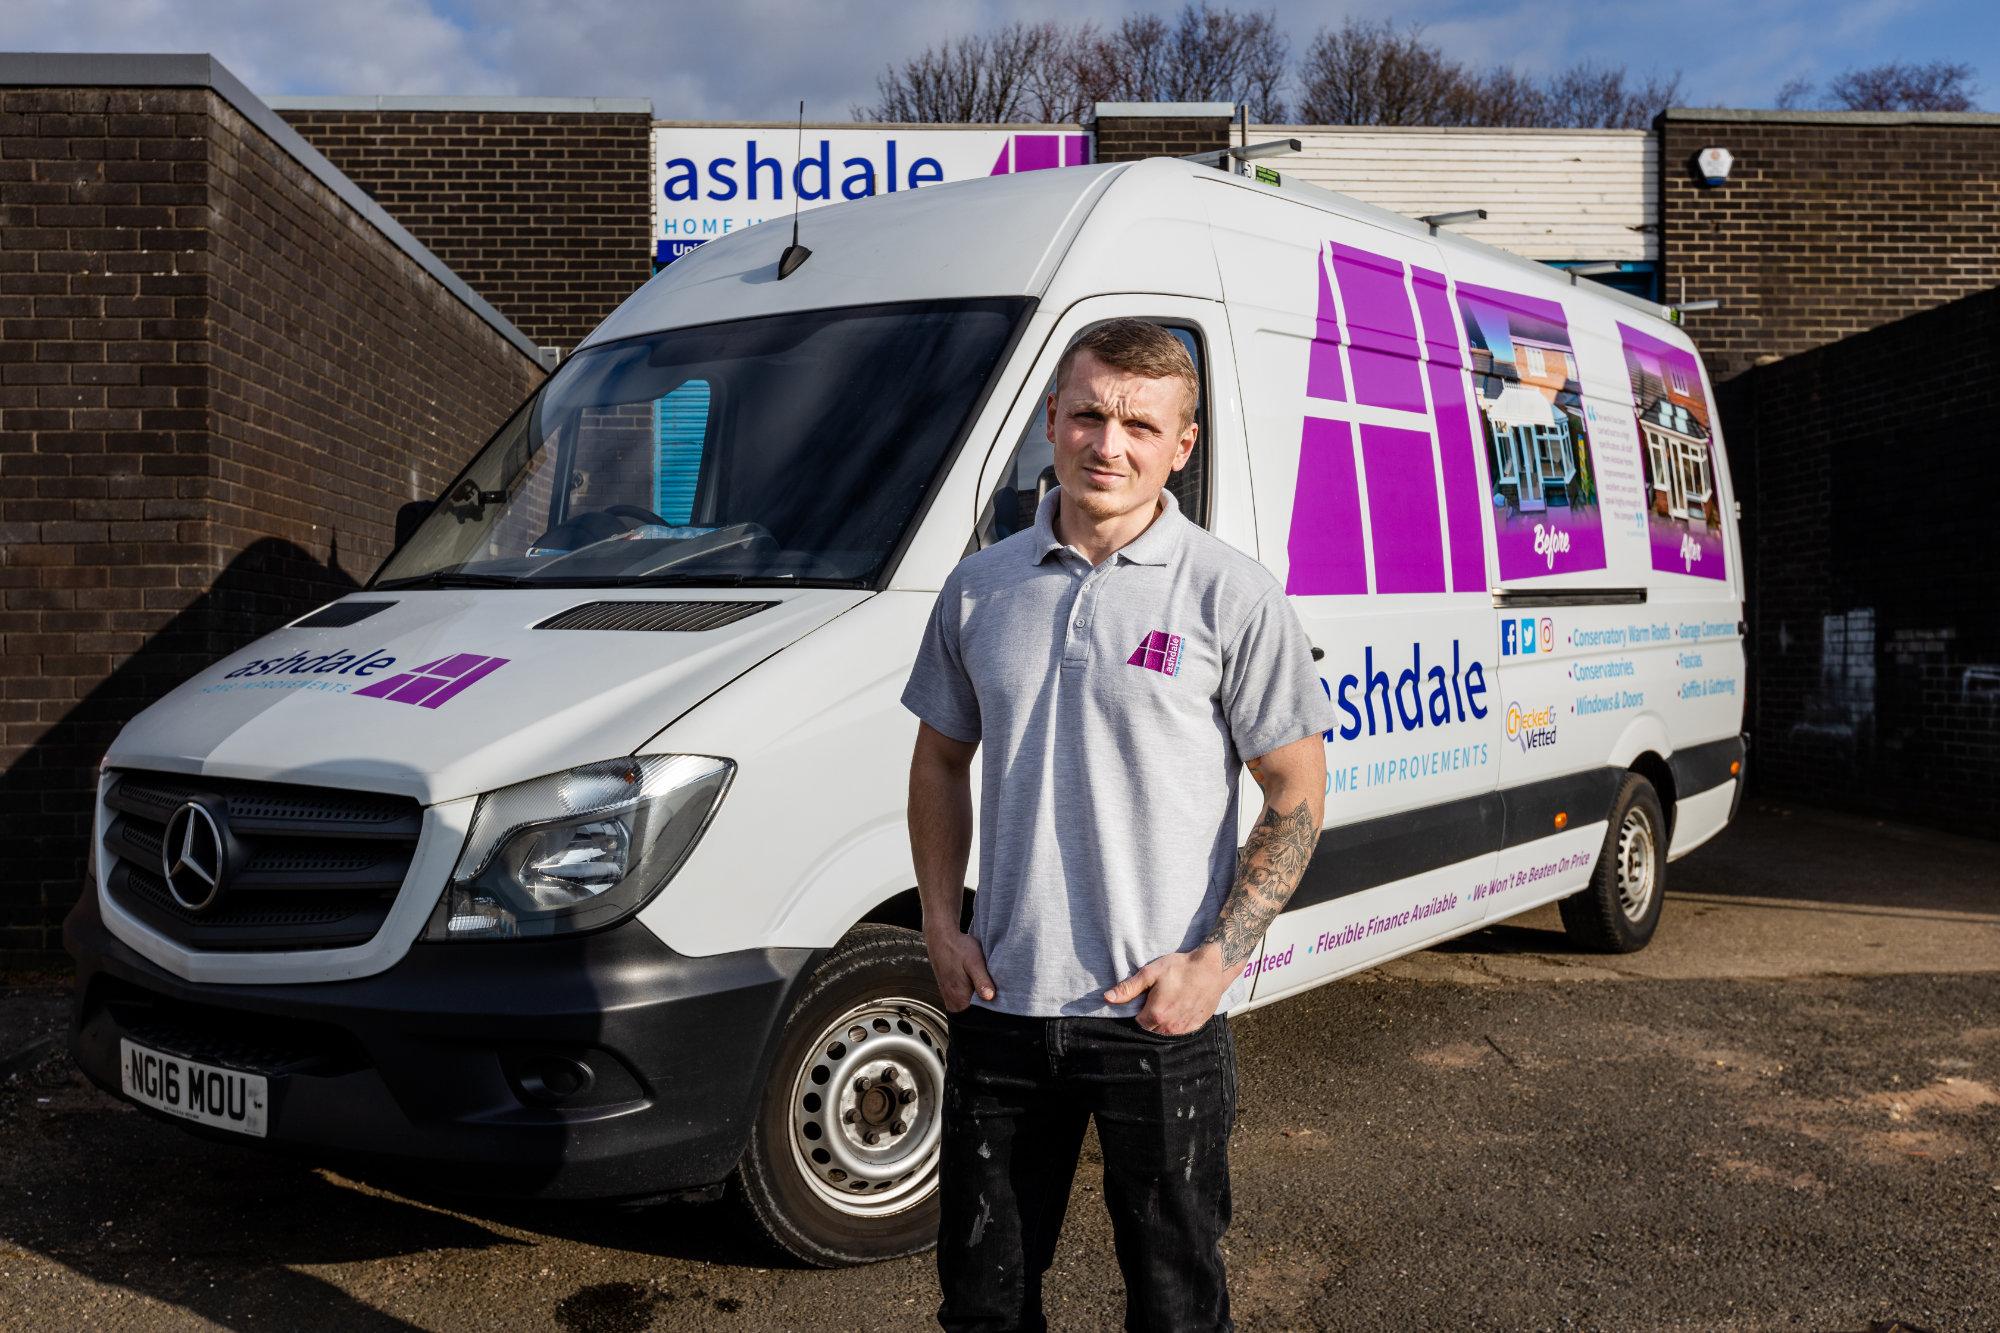 Ashdale Home Improvements van